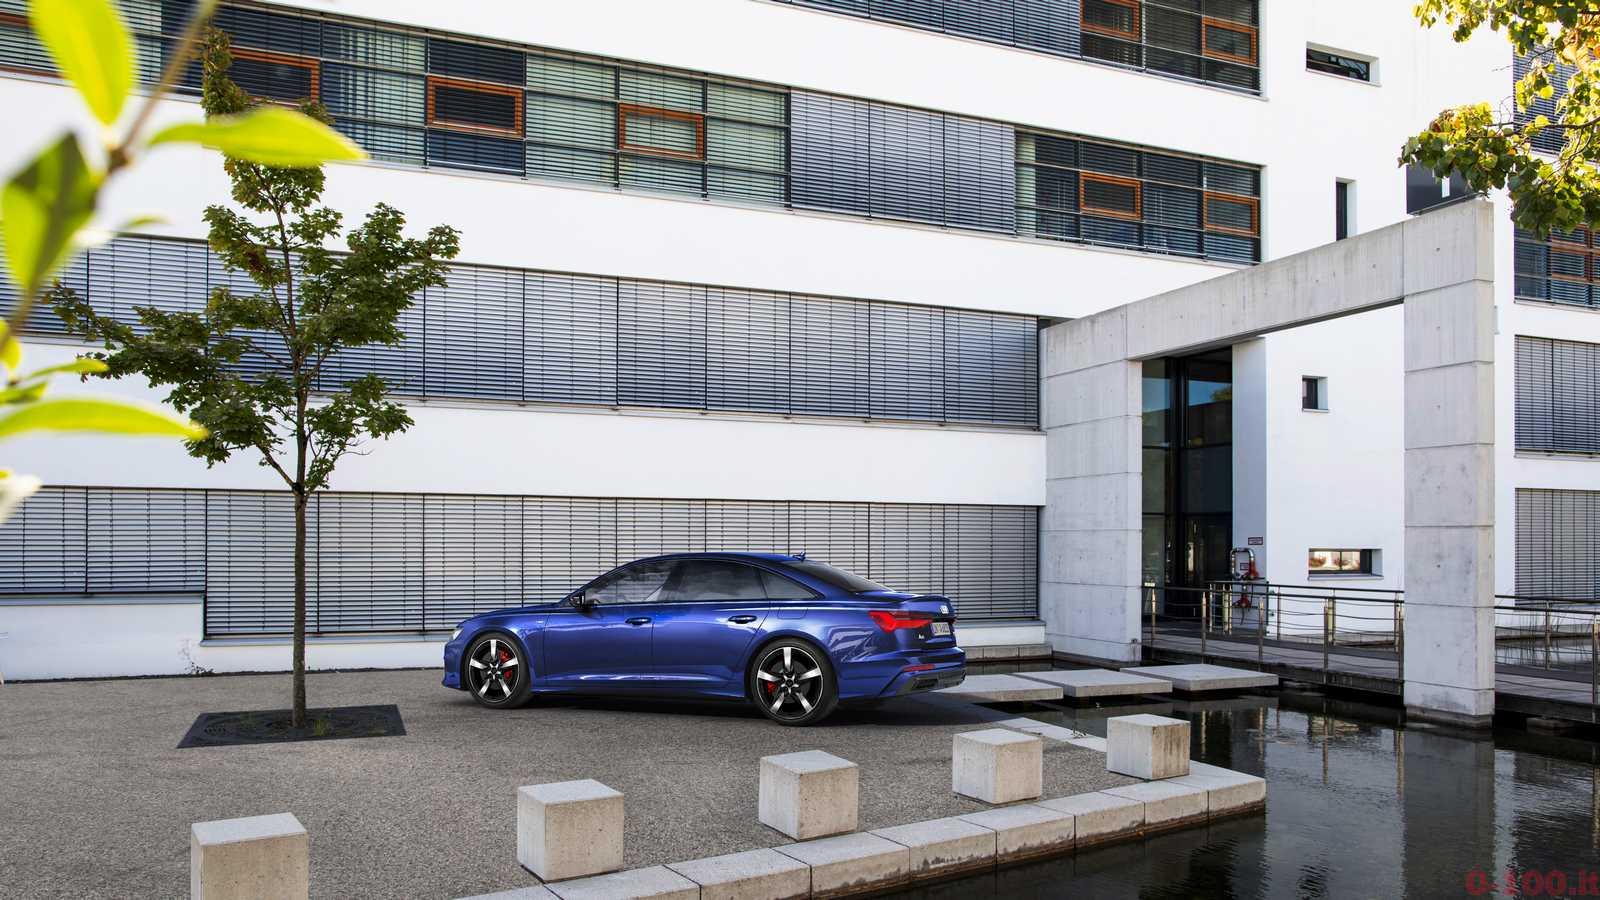 Electrifying full-size sedan: the Audi A6 55 TFSI e quattro